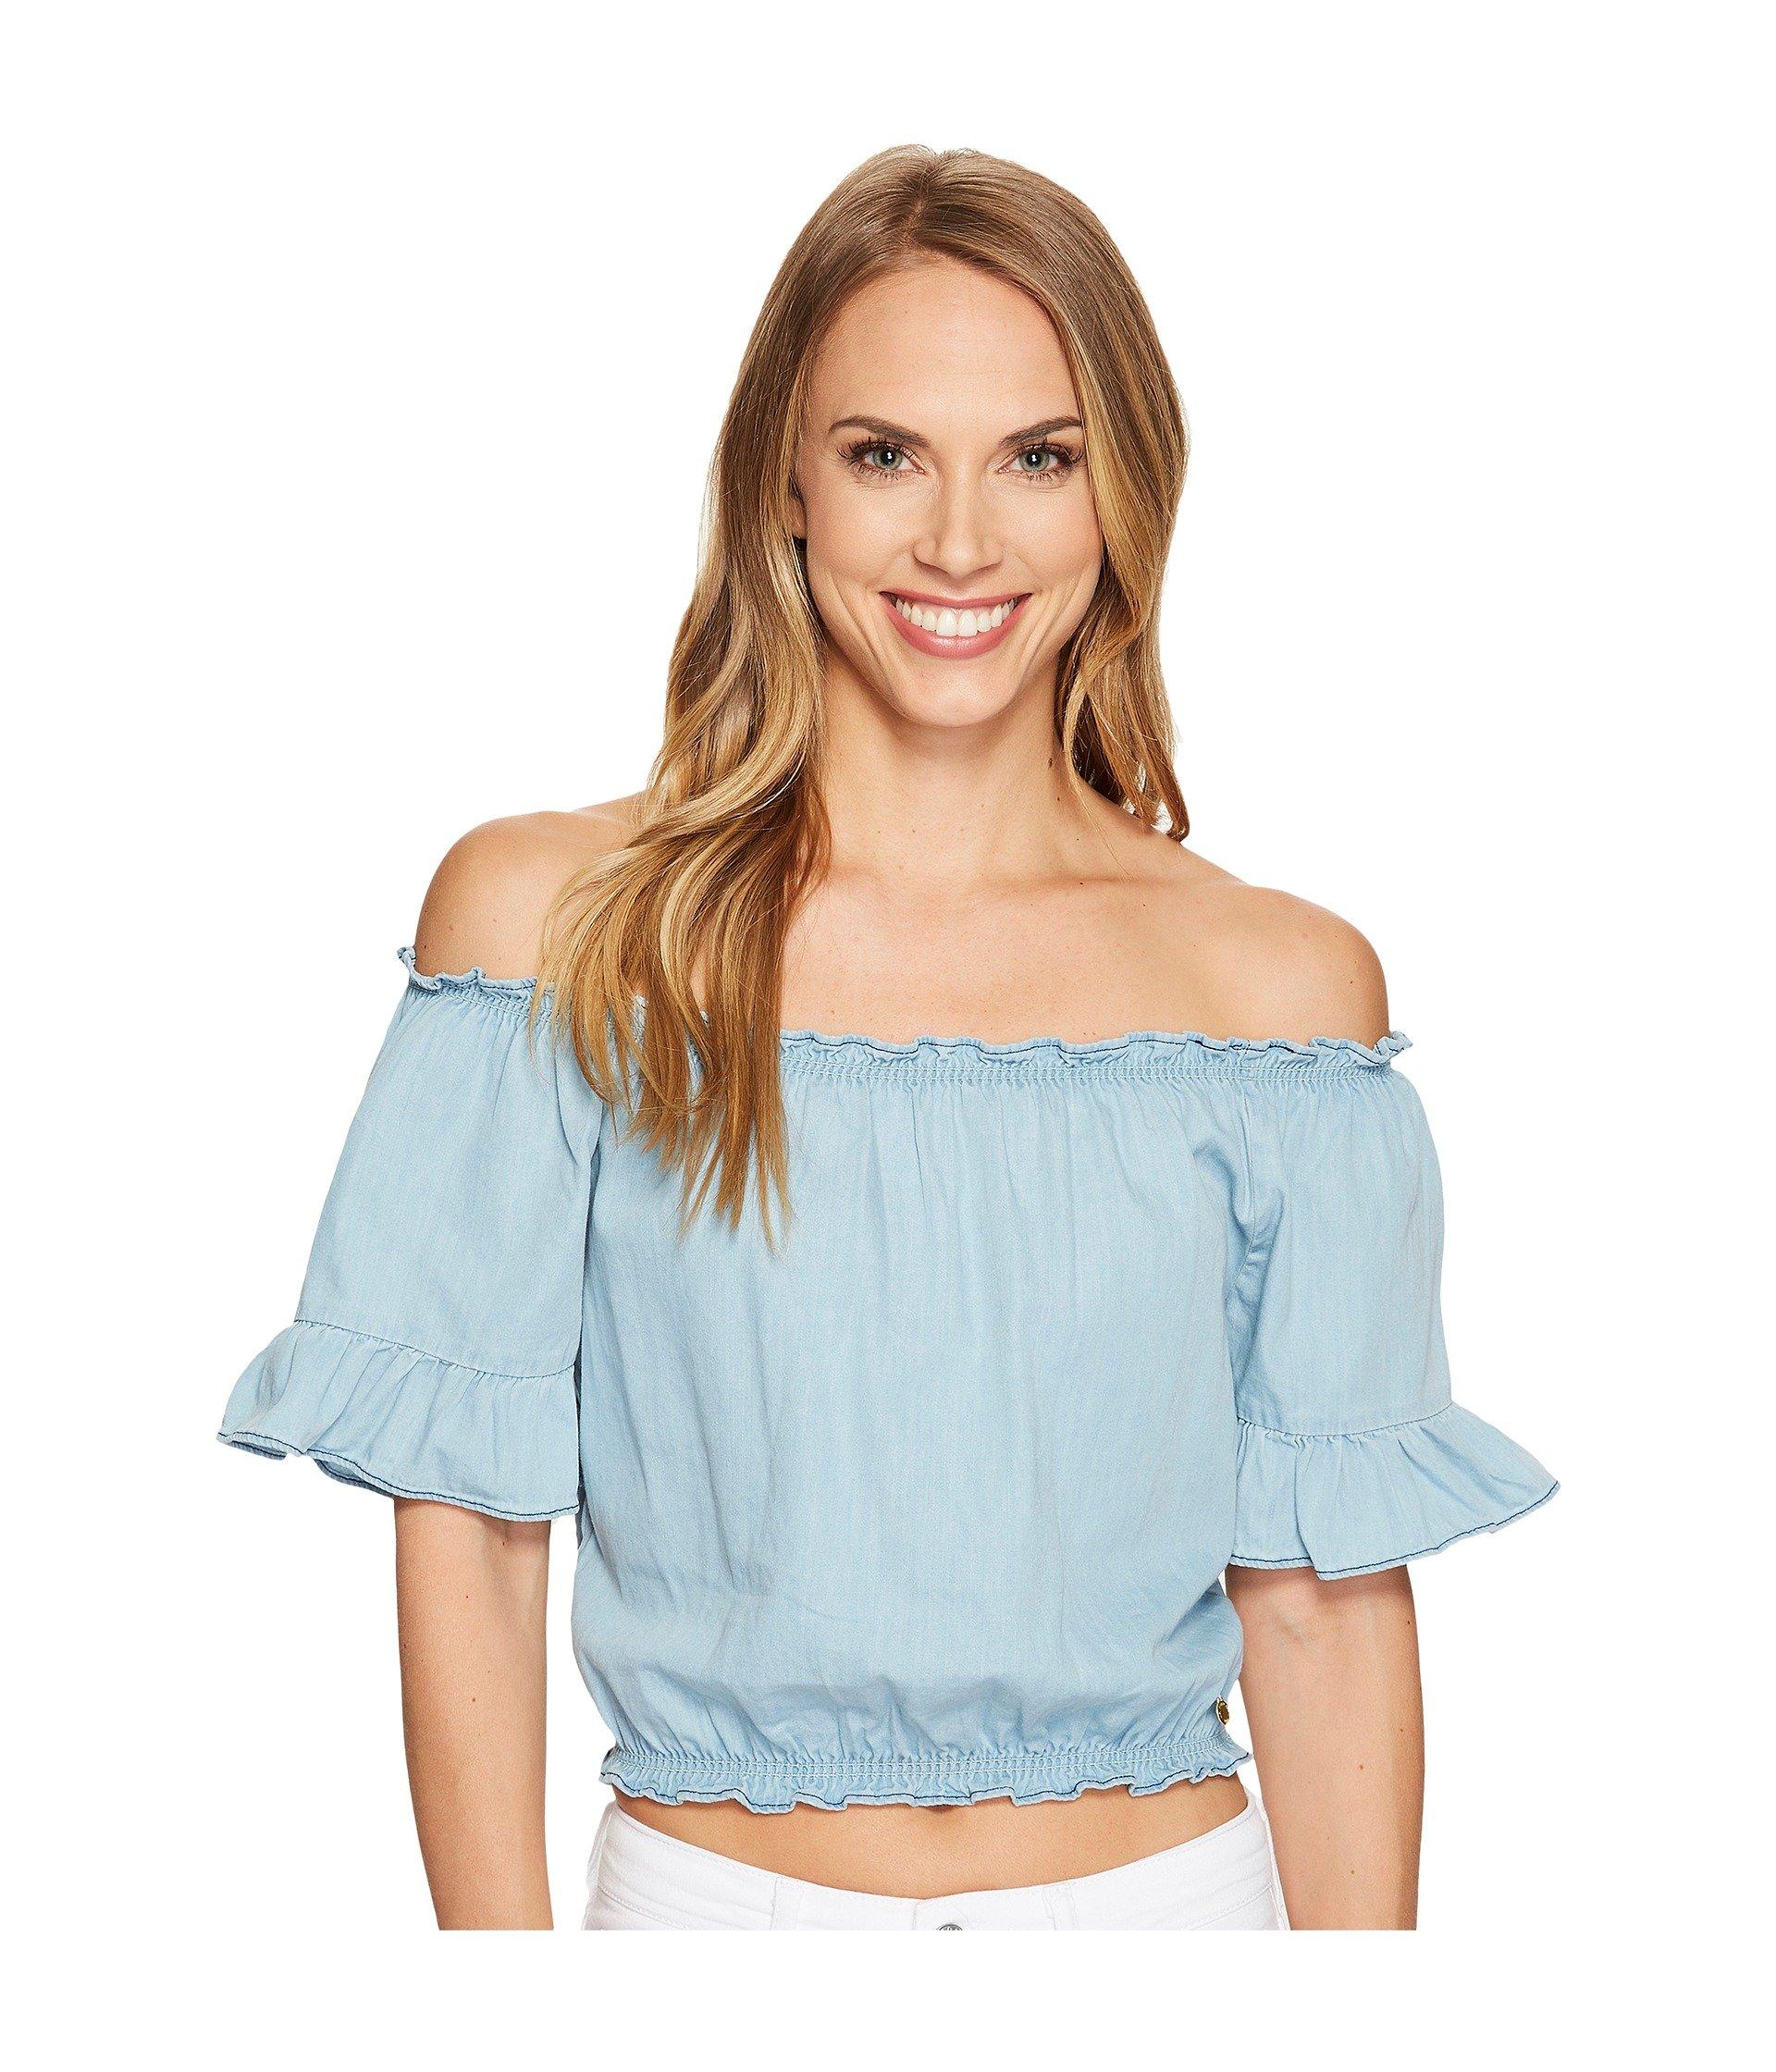 Blusa para Mujer U.S. POLO ASSN. Denim Off the Shoulder Crop Top  + U.S. POLO ASSN. en VeoyCompro.net